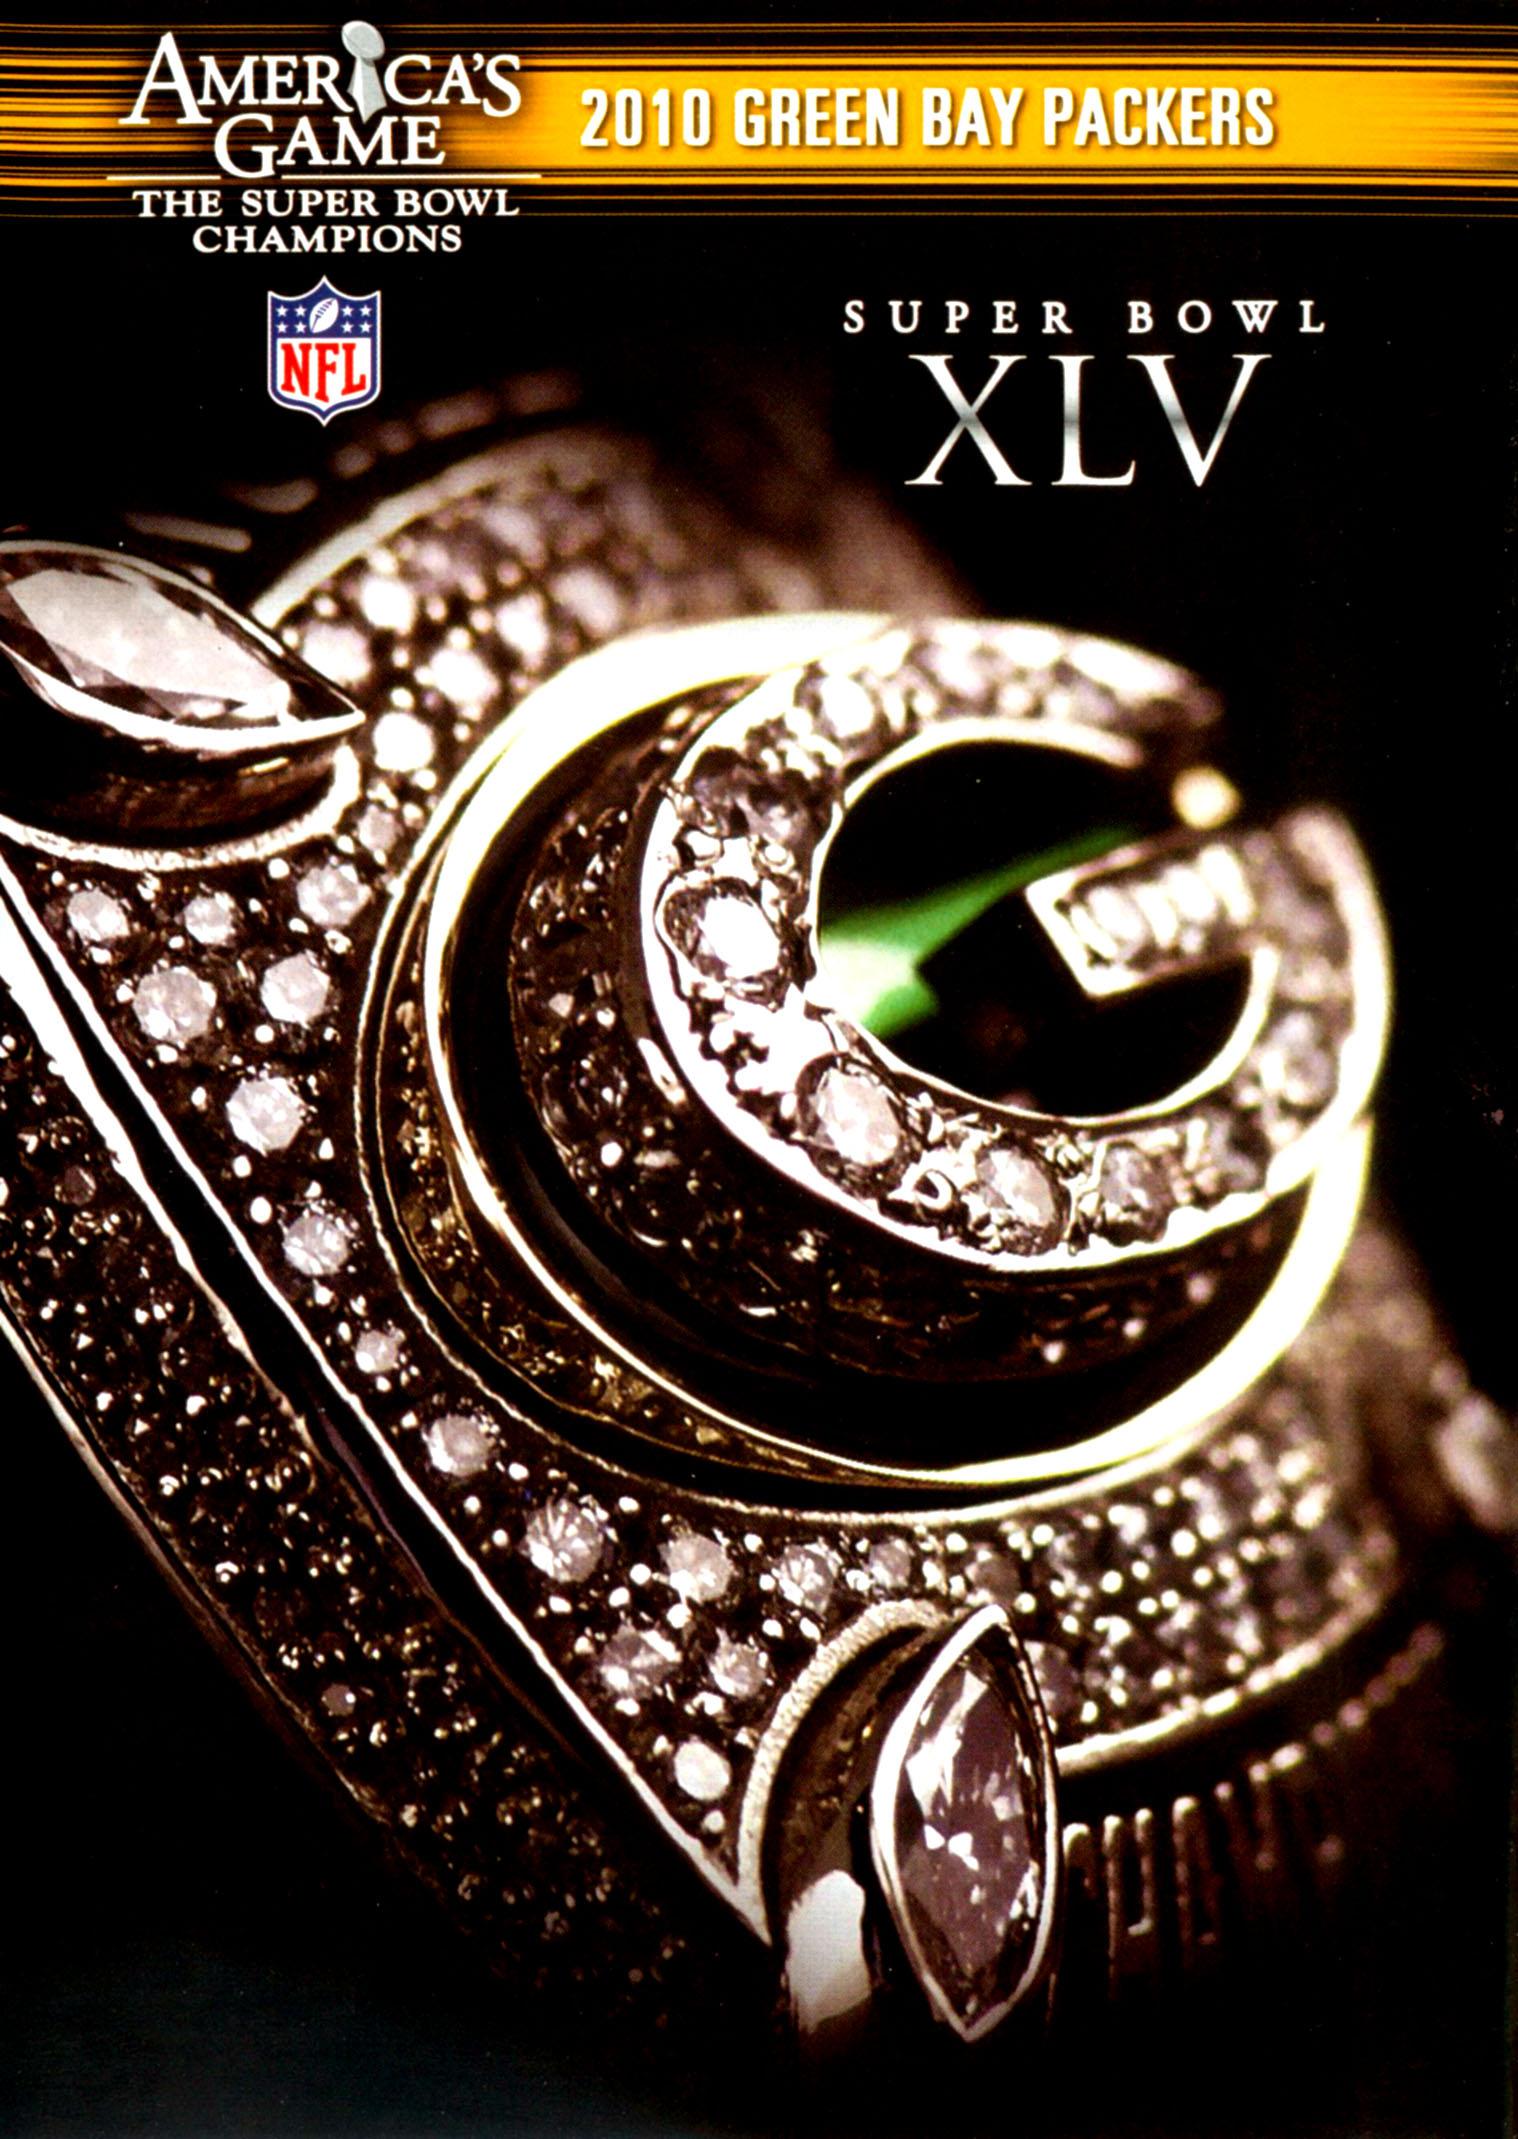 NFL: America's Game - 2010 Green Bay Packers - Super Bowl XLV